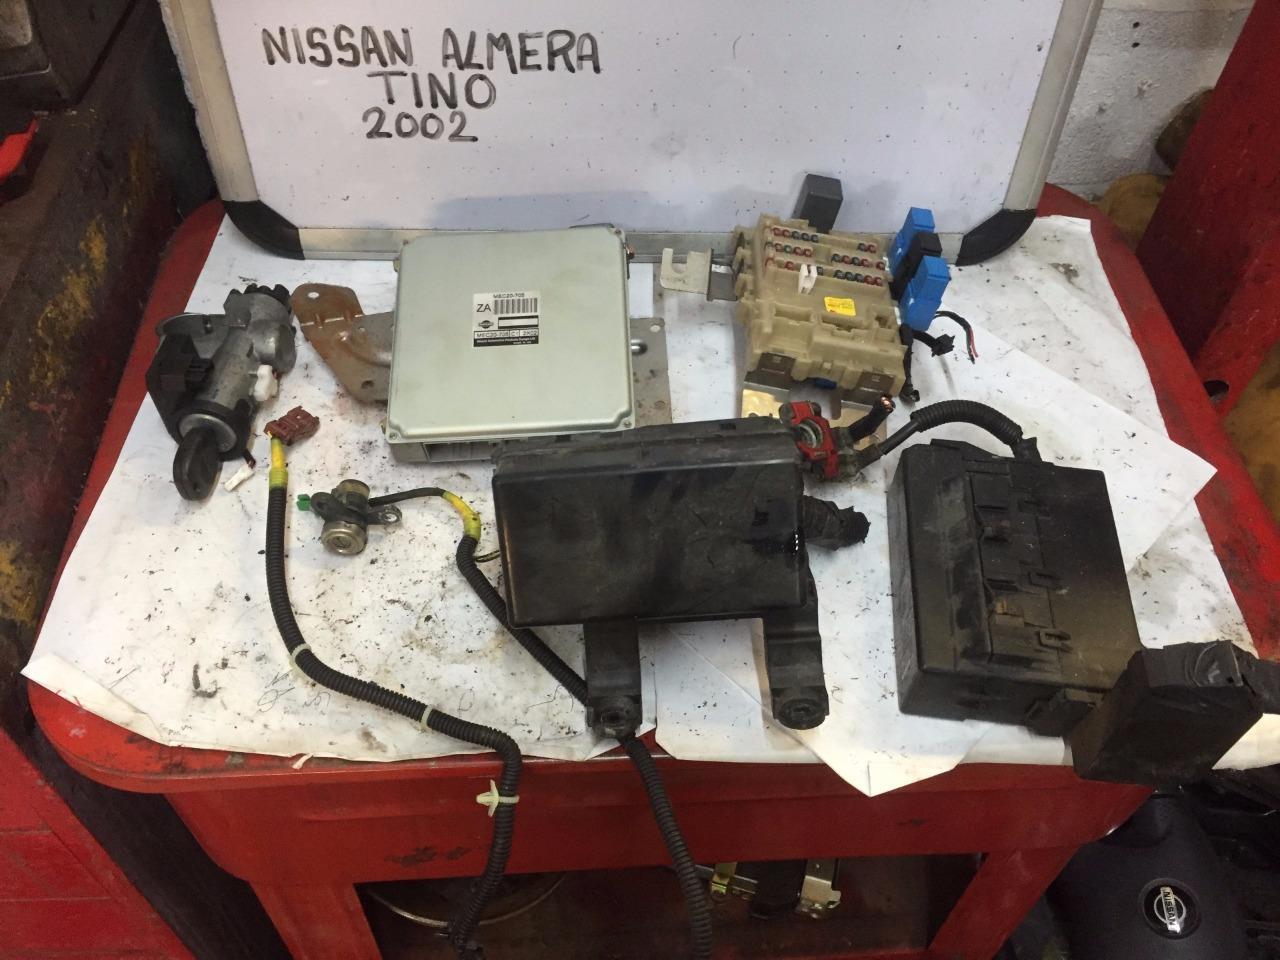 nissan almera tino radio wiring diagram honda motorcycle headlight fuse box location library